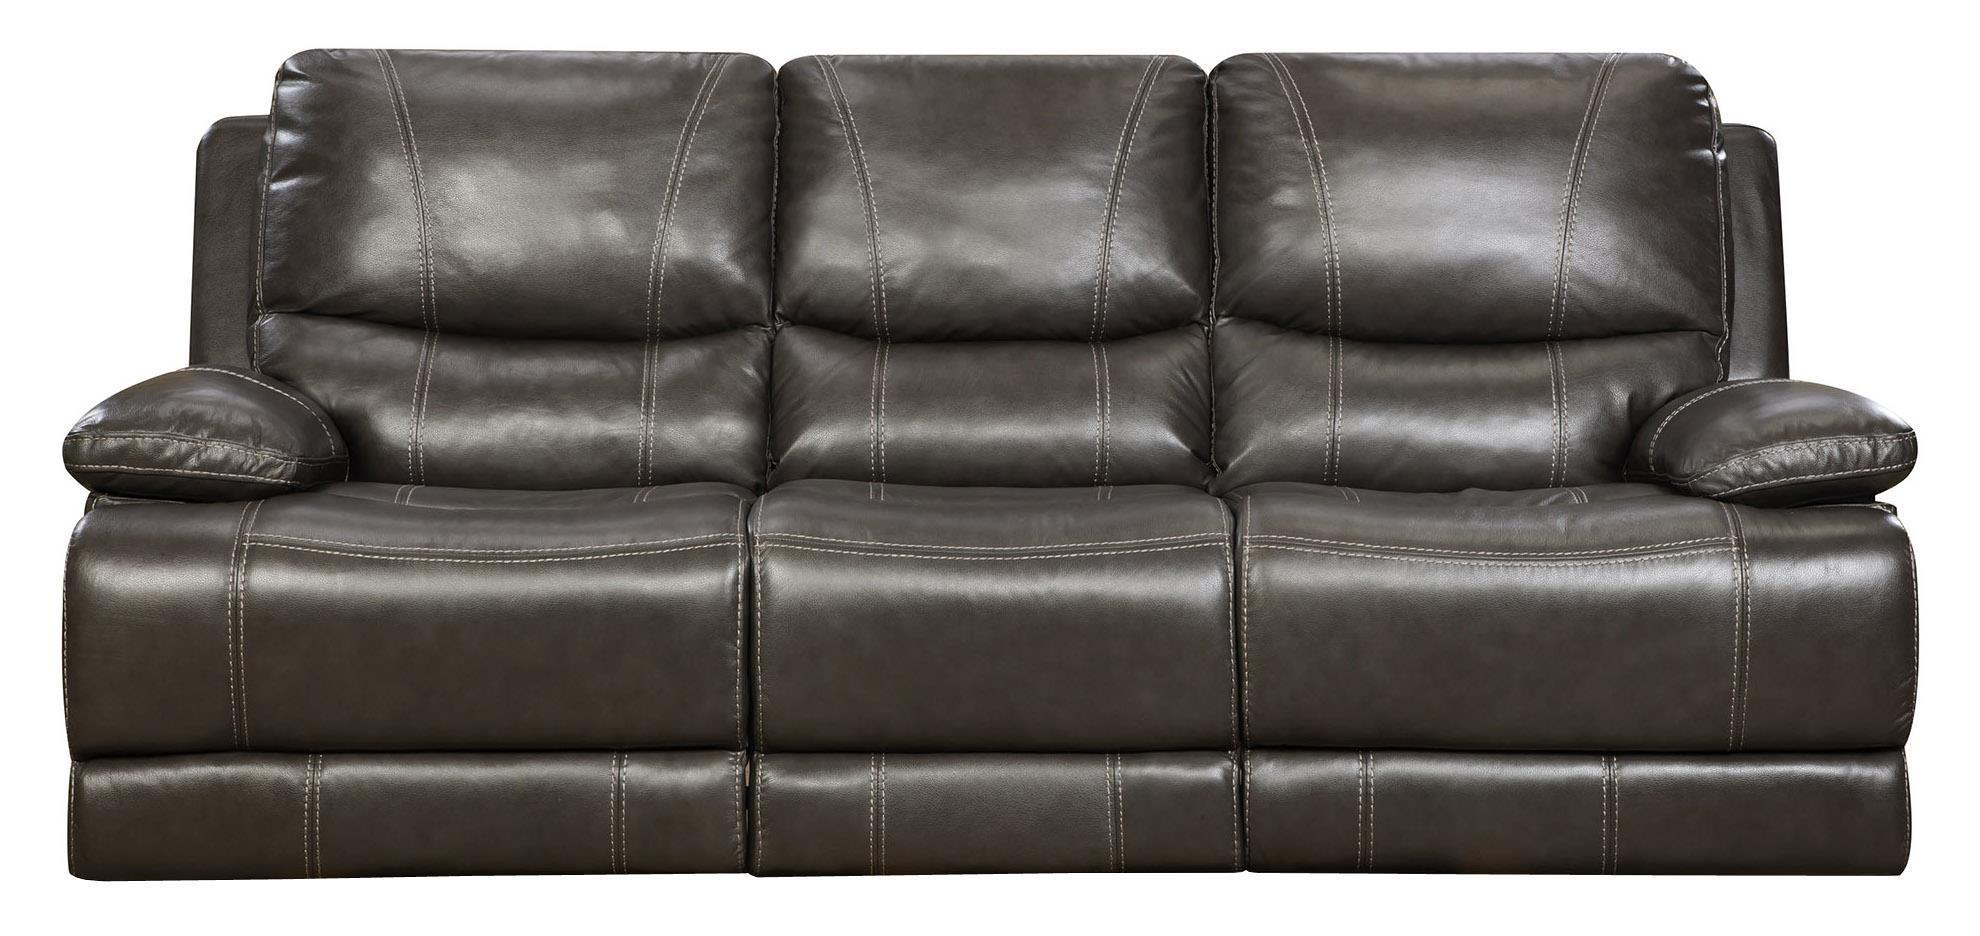 Corinthian Brooklyn Charcoal Brooklyn Charcoal Leather Reclining Regarding Corinthian Sofas (Image 8 of 20)